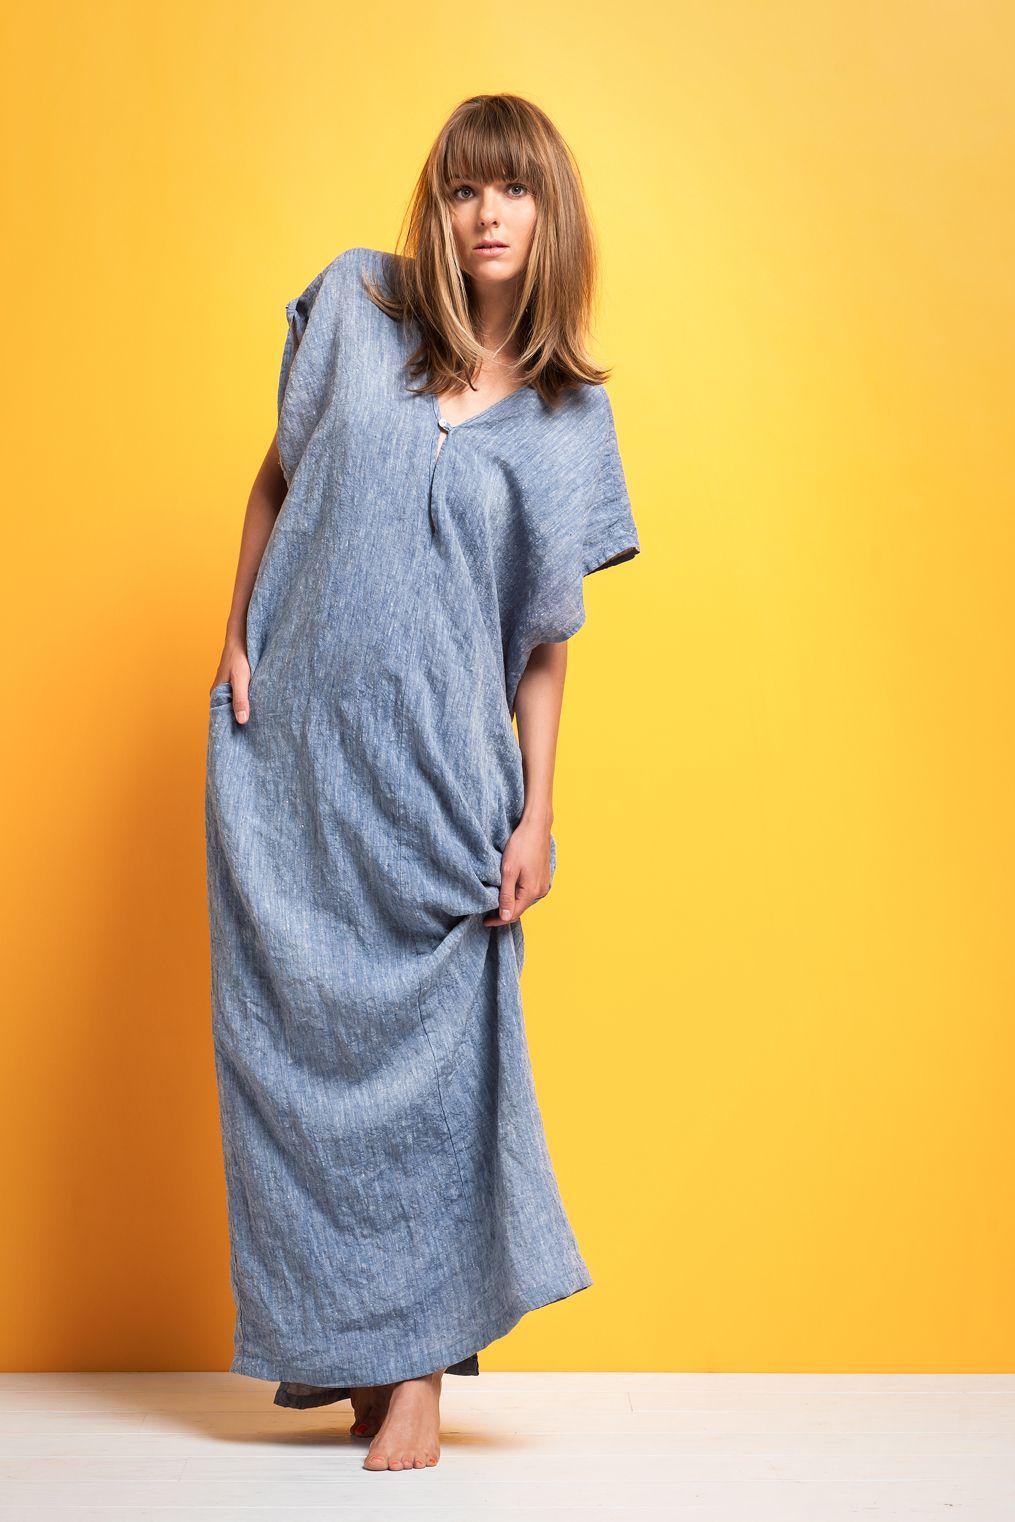 CLUNS › DRESSES › HUMANOID WEBSHOP